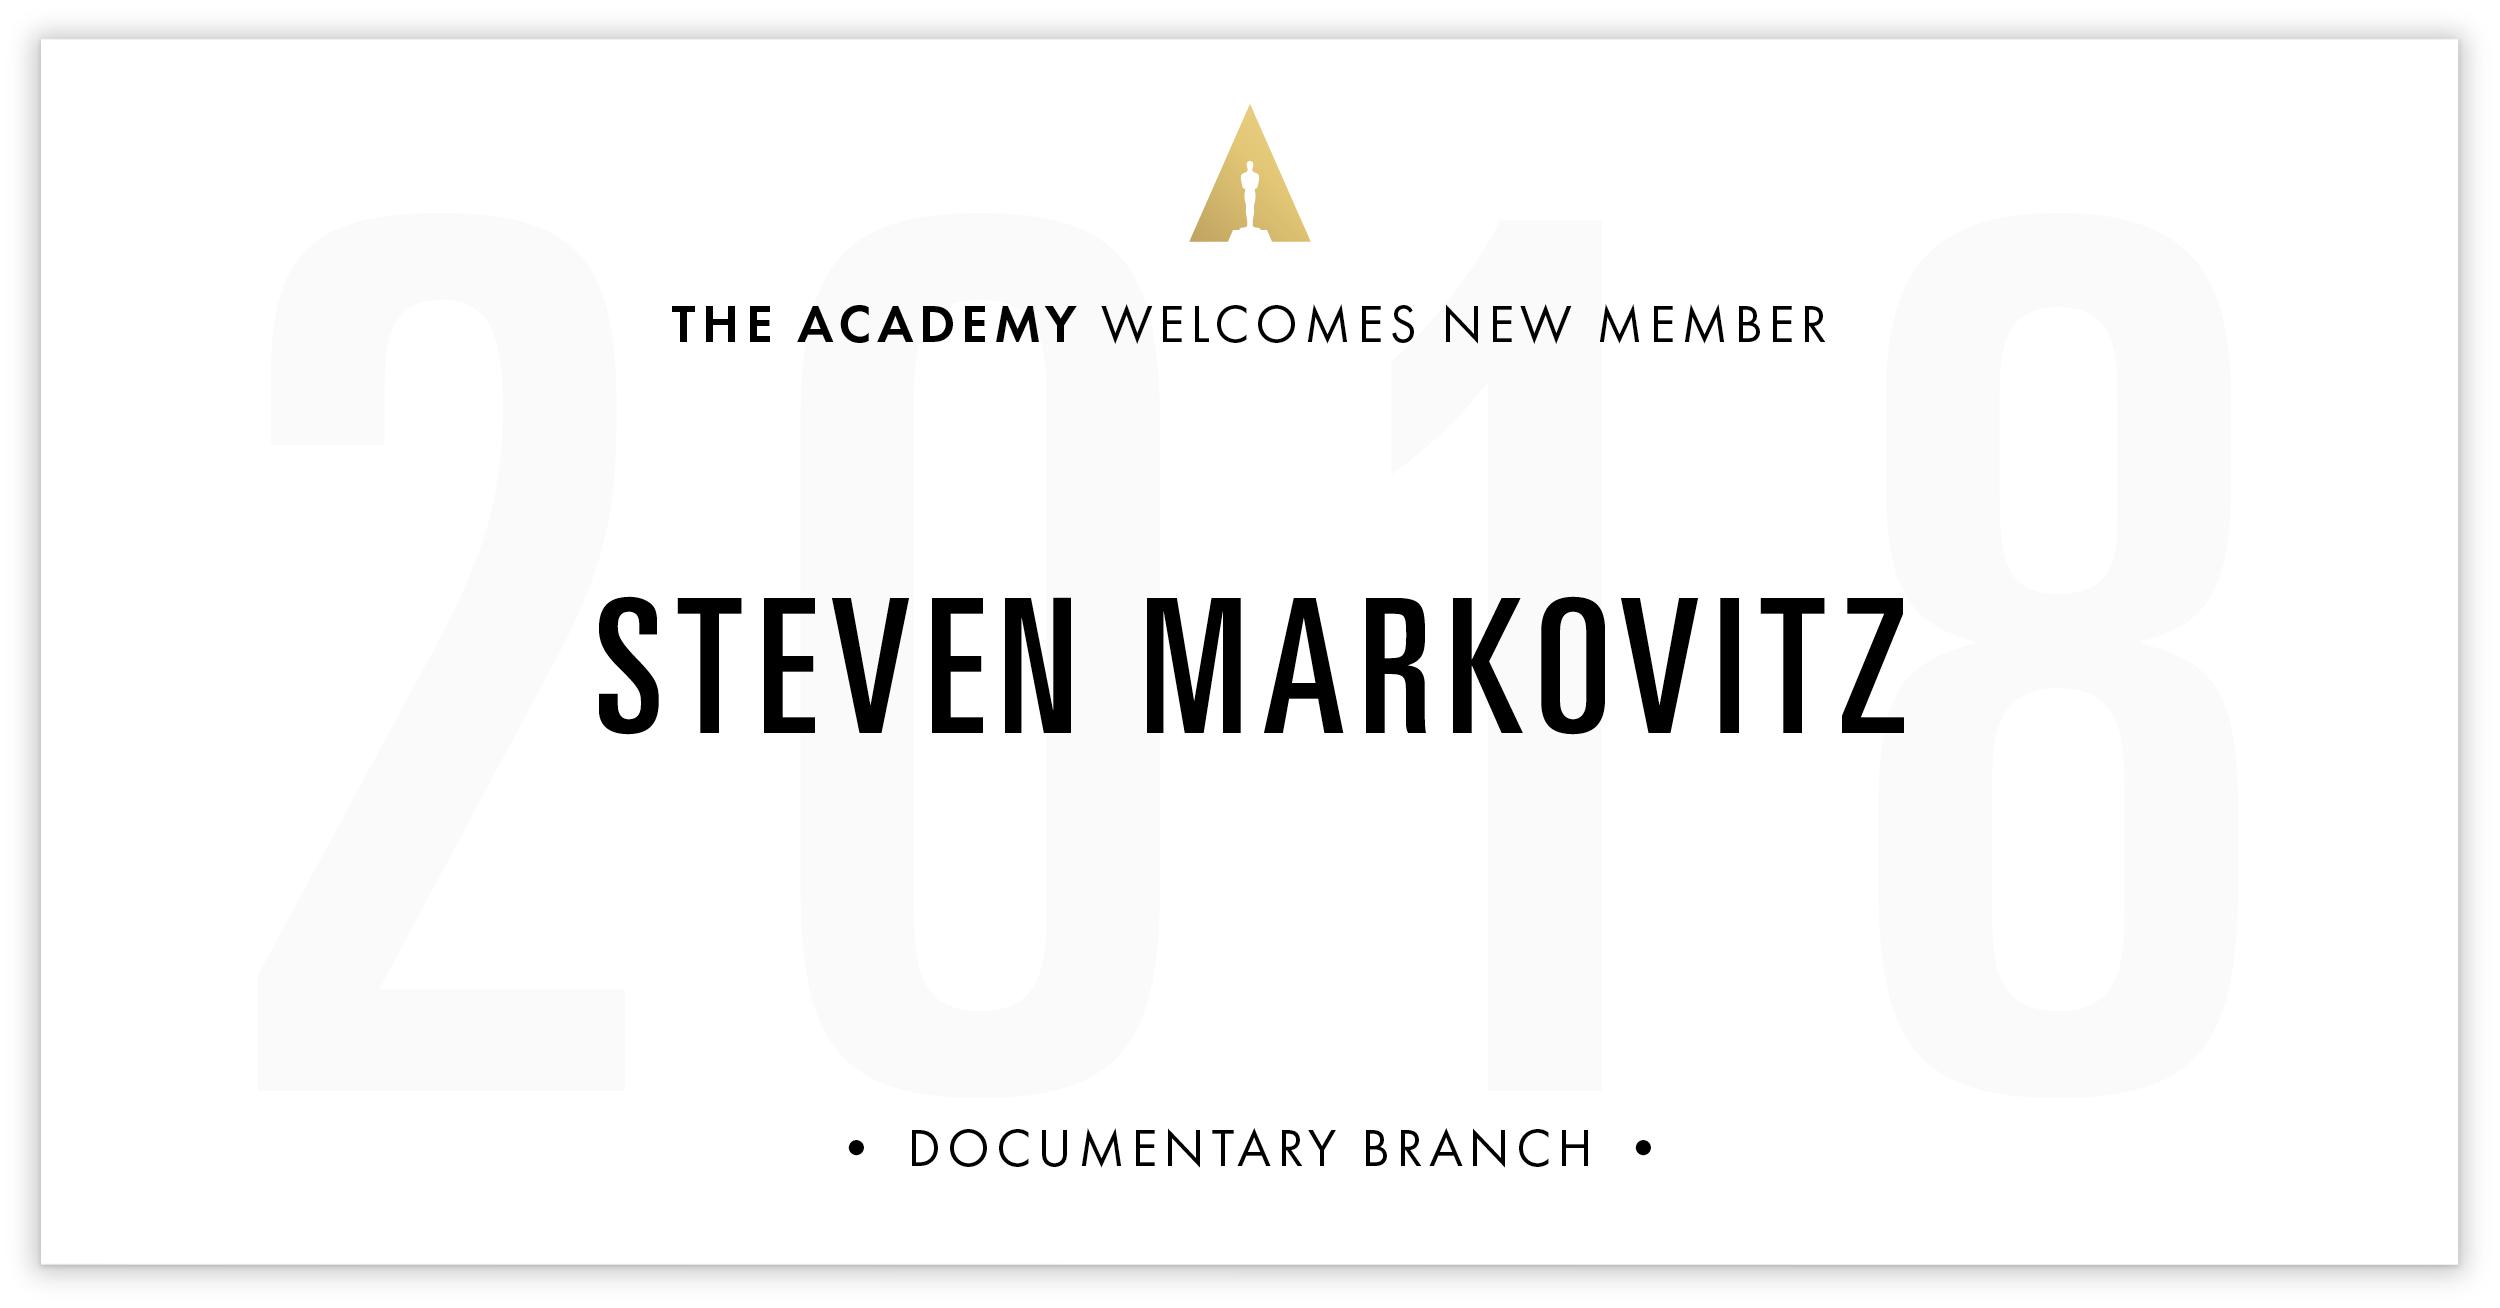 Steven Markovitz is invited!